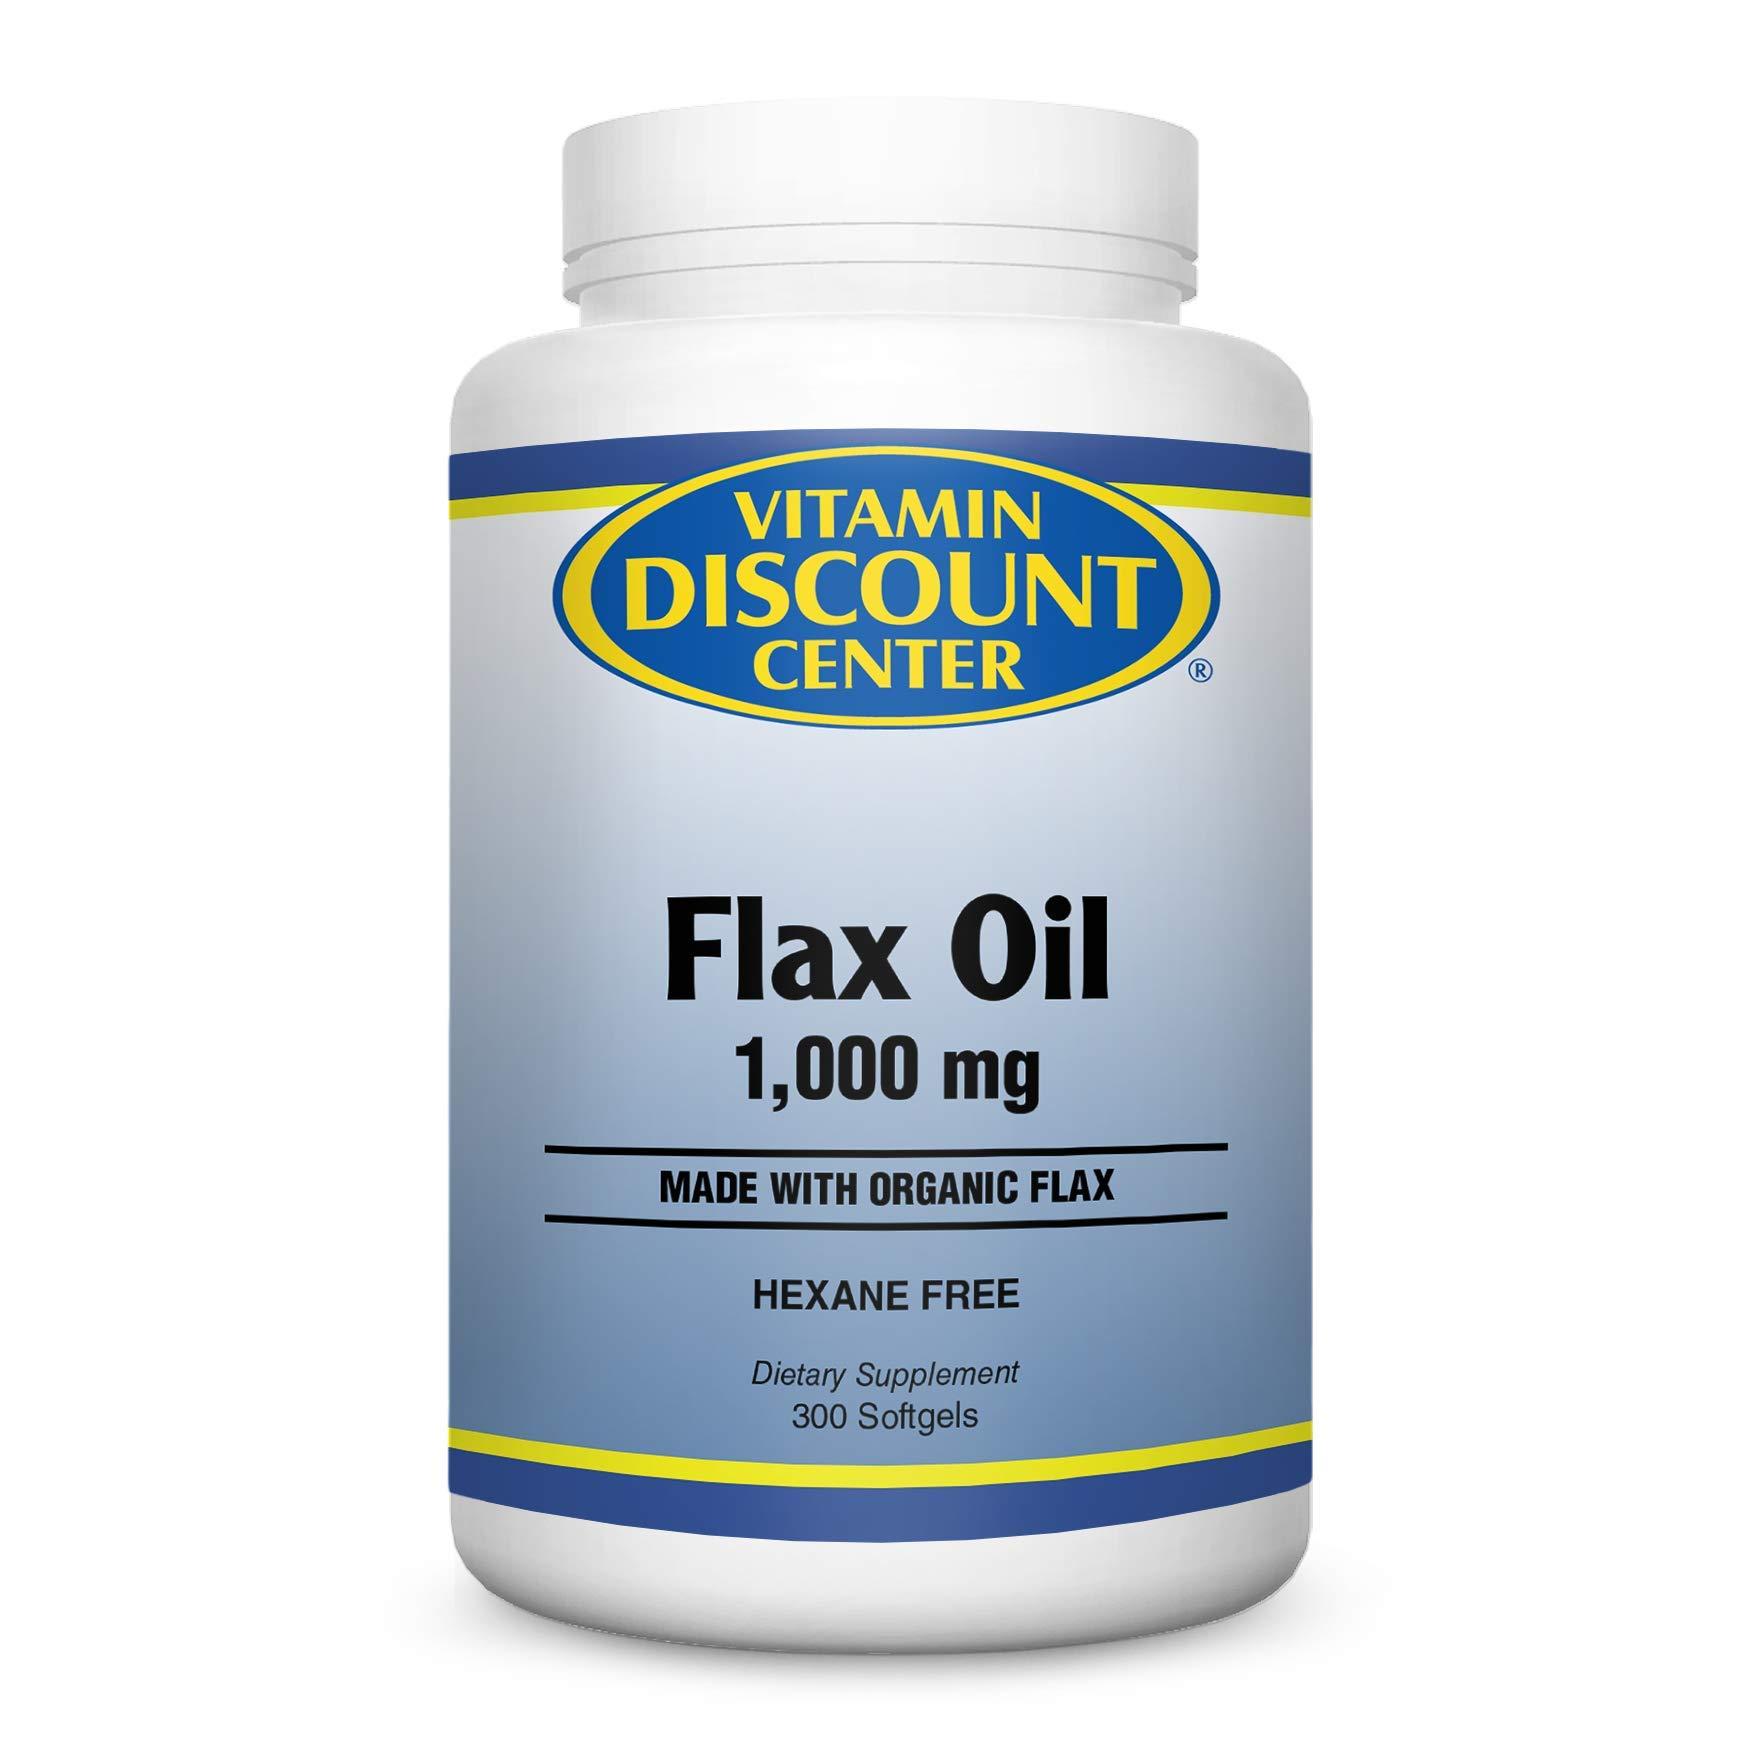 Vitamin Discount Center Organic Flax Oil 1000mg, 300 Softgels